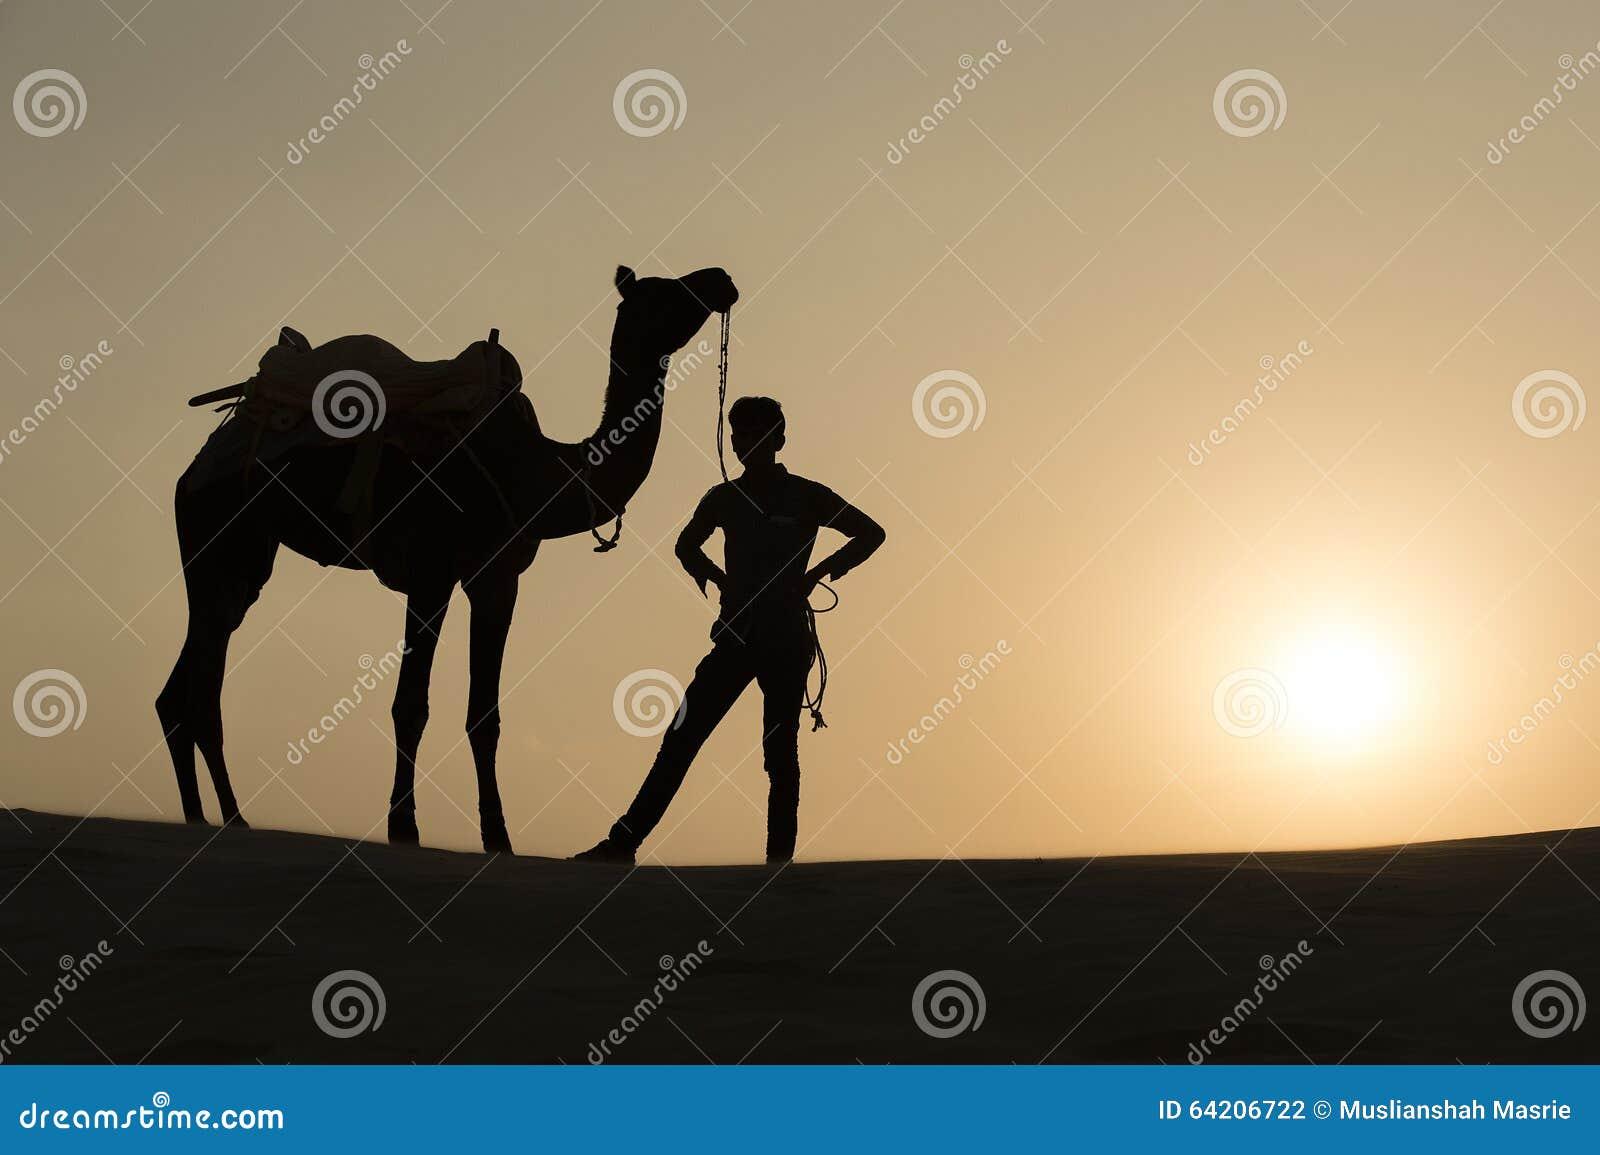 Silhoutte Of Camel Boy Crossing In The Thar Desert  Stock